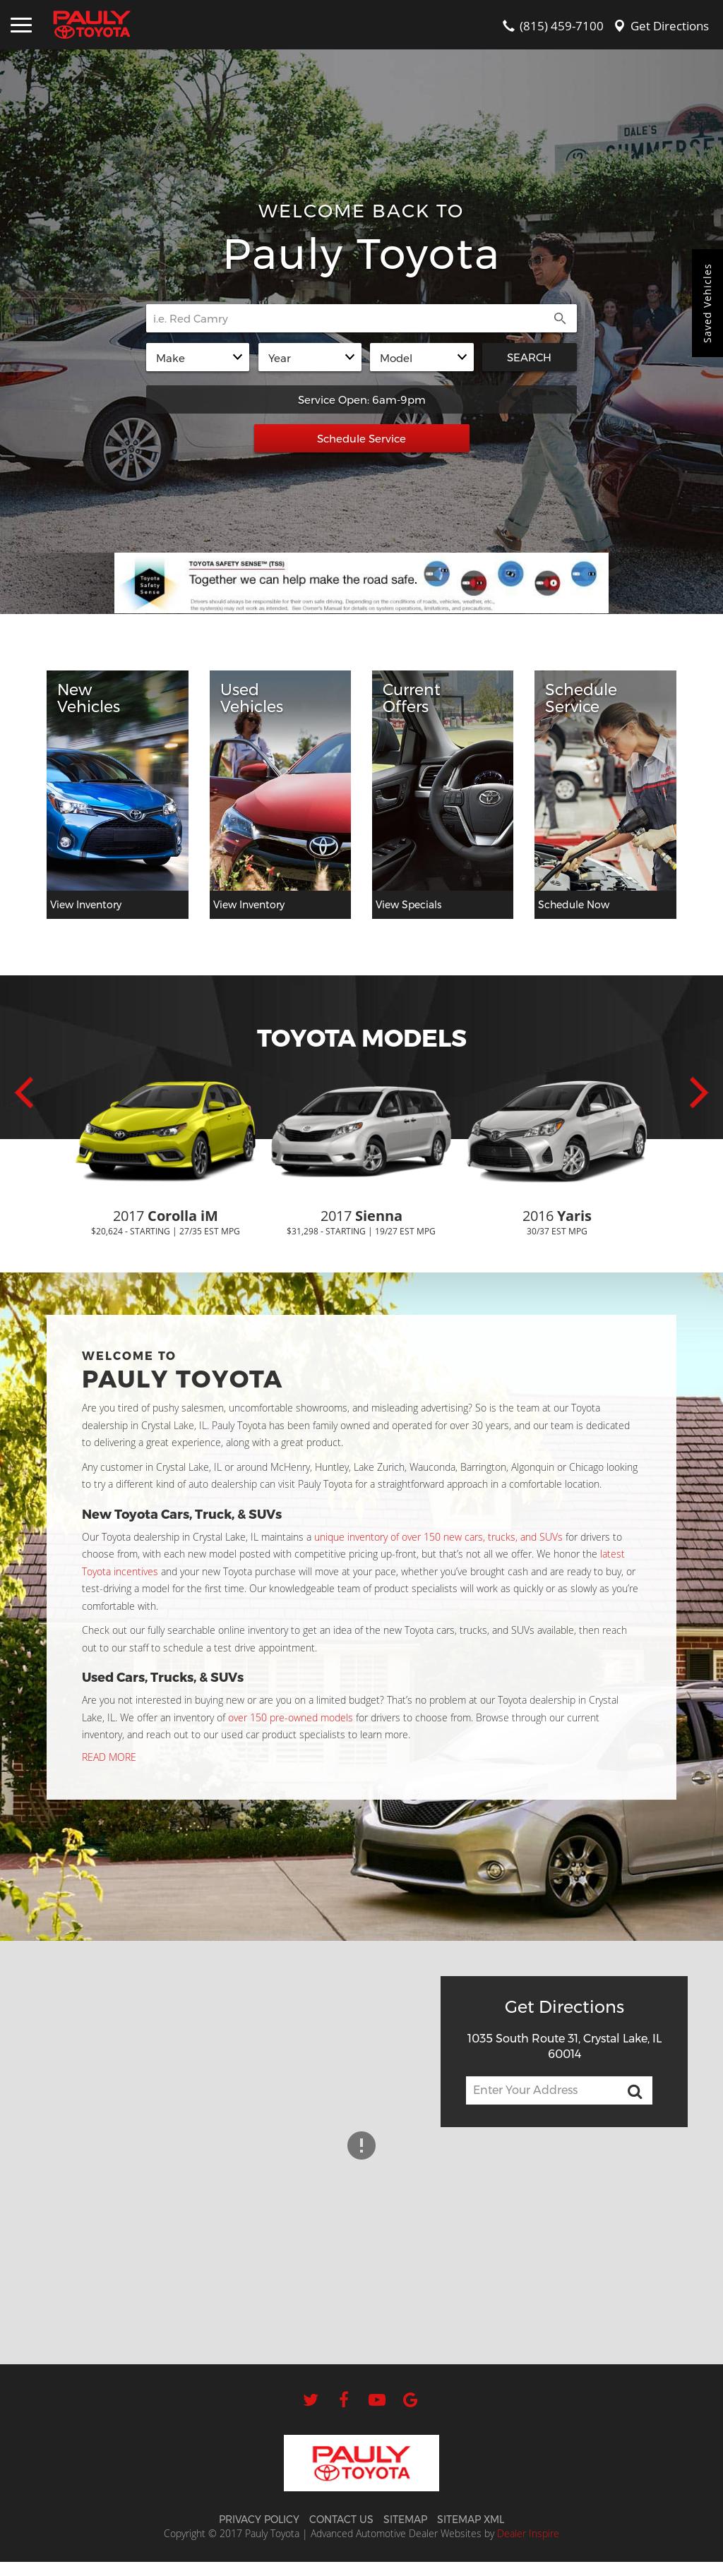 Pauly Toyota Website History